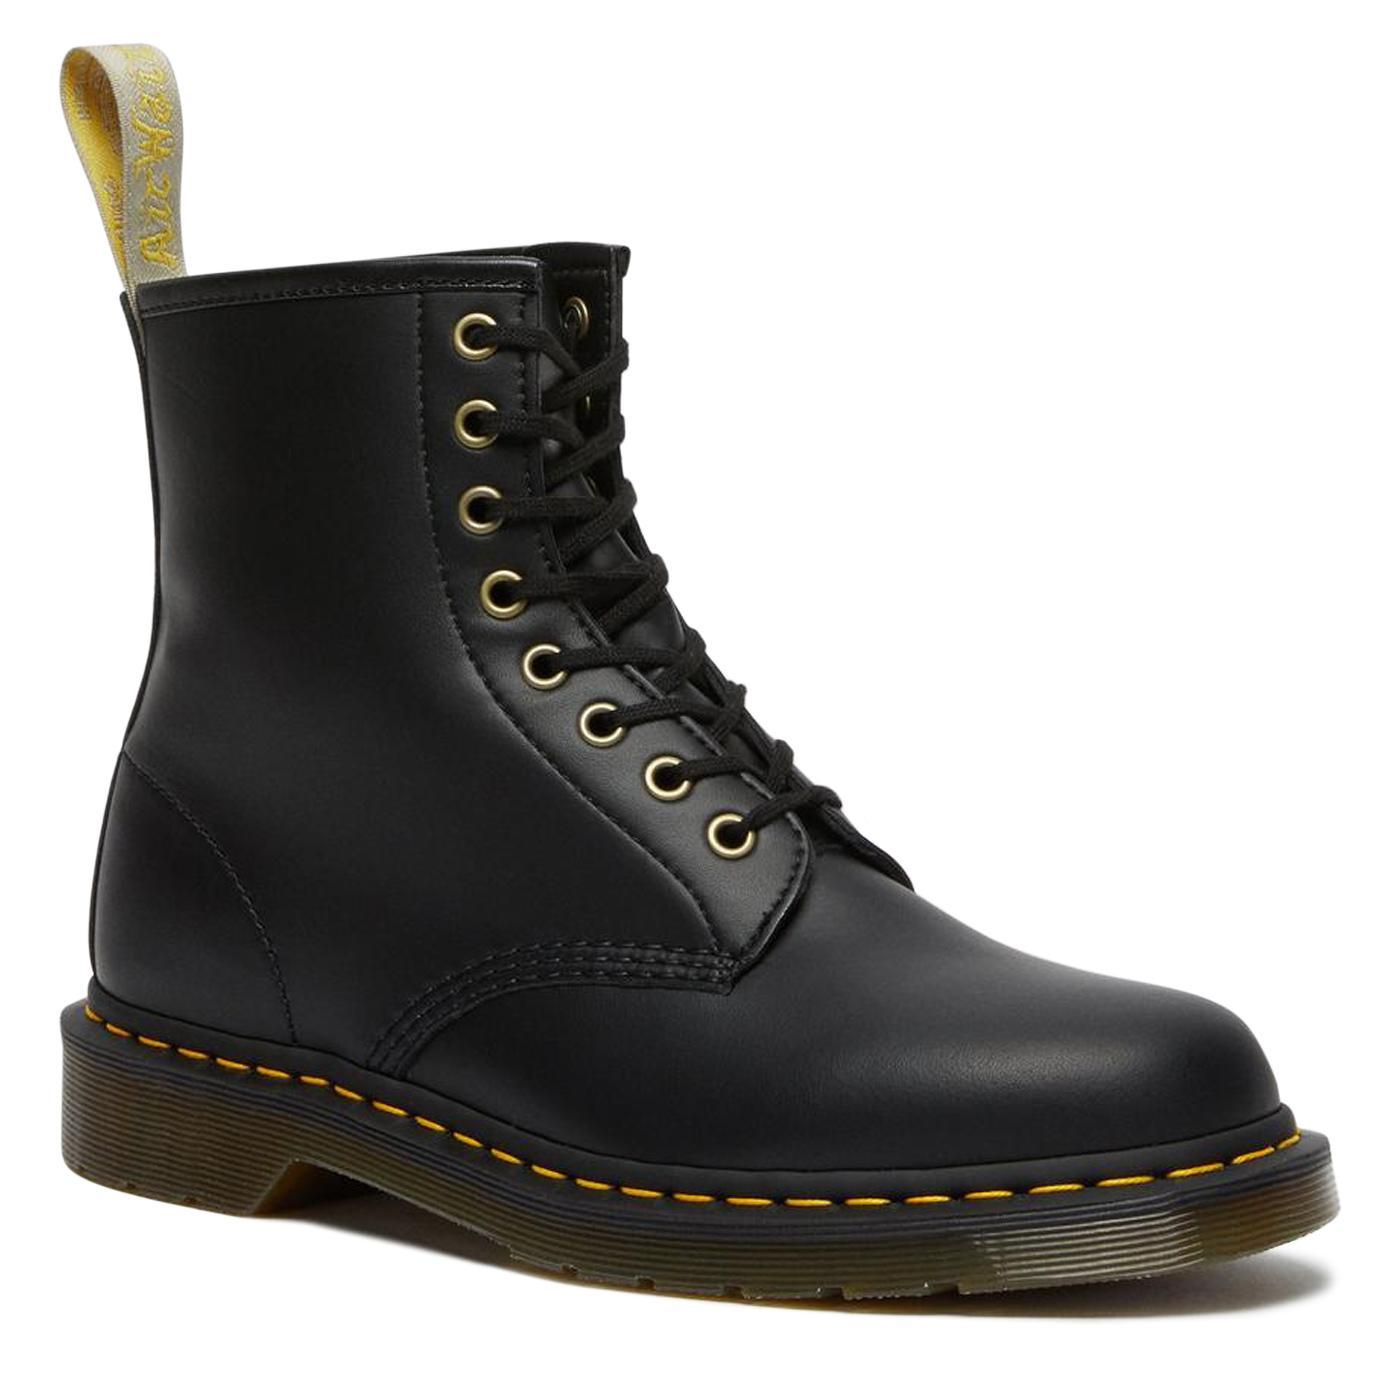 DR MARTENS Vegan 1460 Women's Felix Rub Off Boots